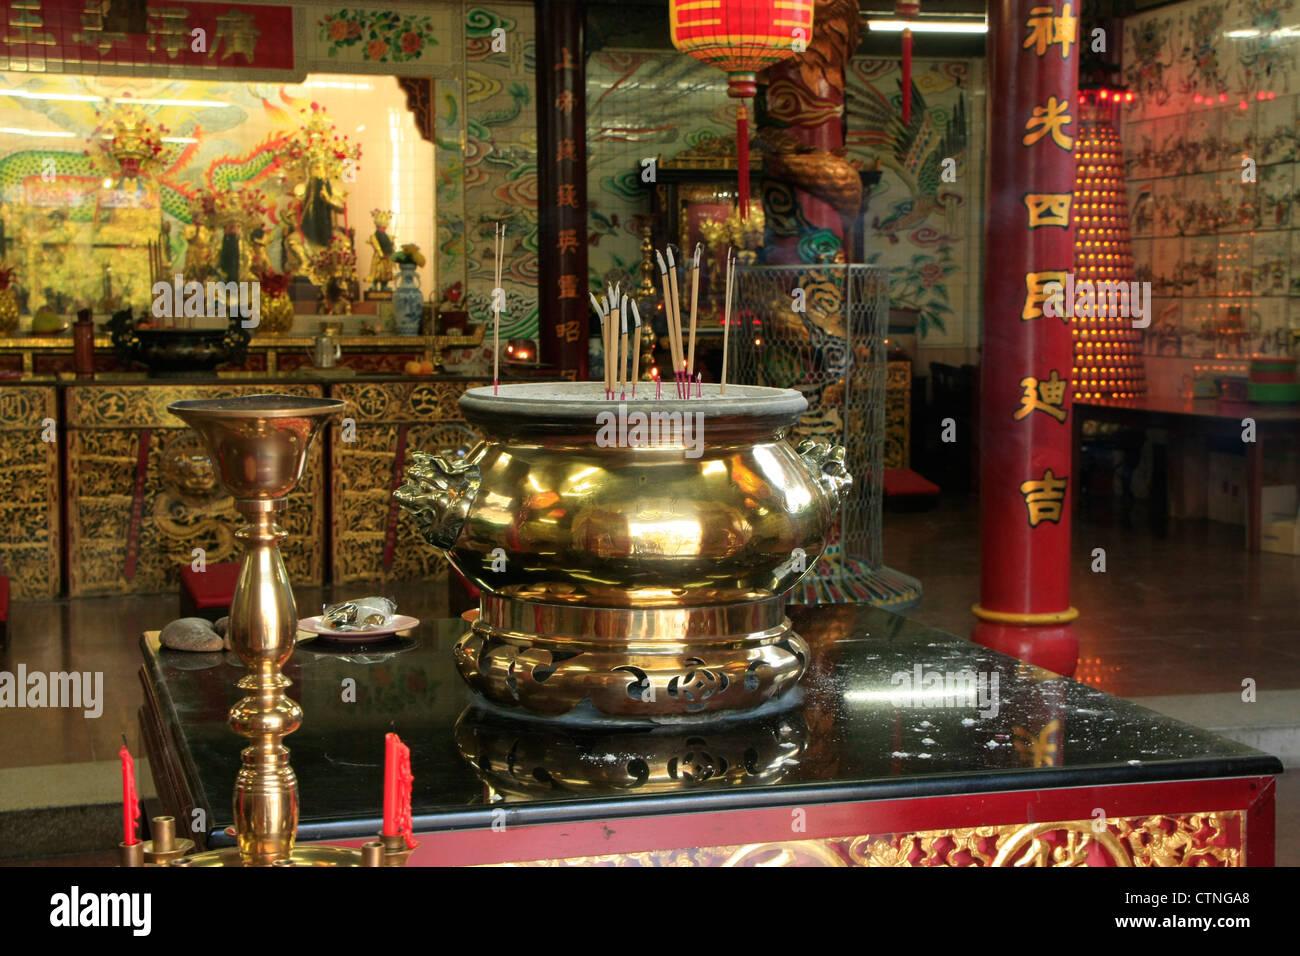 Interior of Chinese buddhist temple, Bandar Seri Begawan, Brunei, Southeast Asia - Stock Image